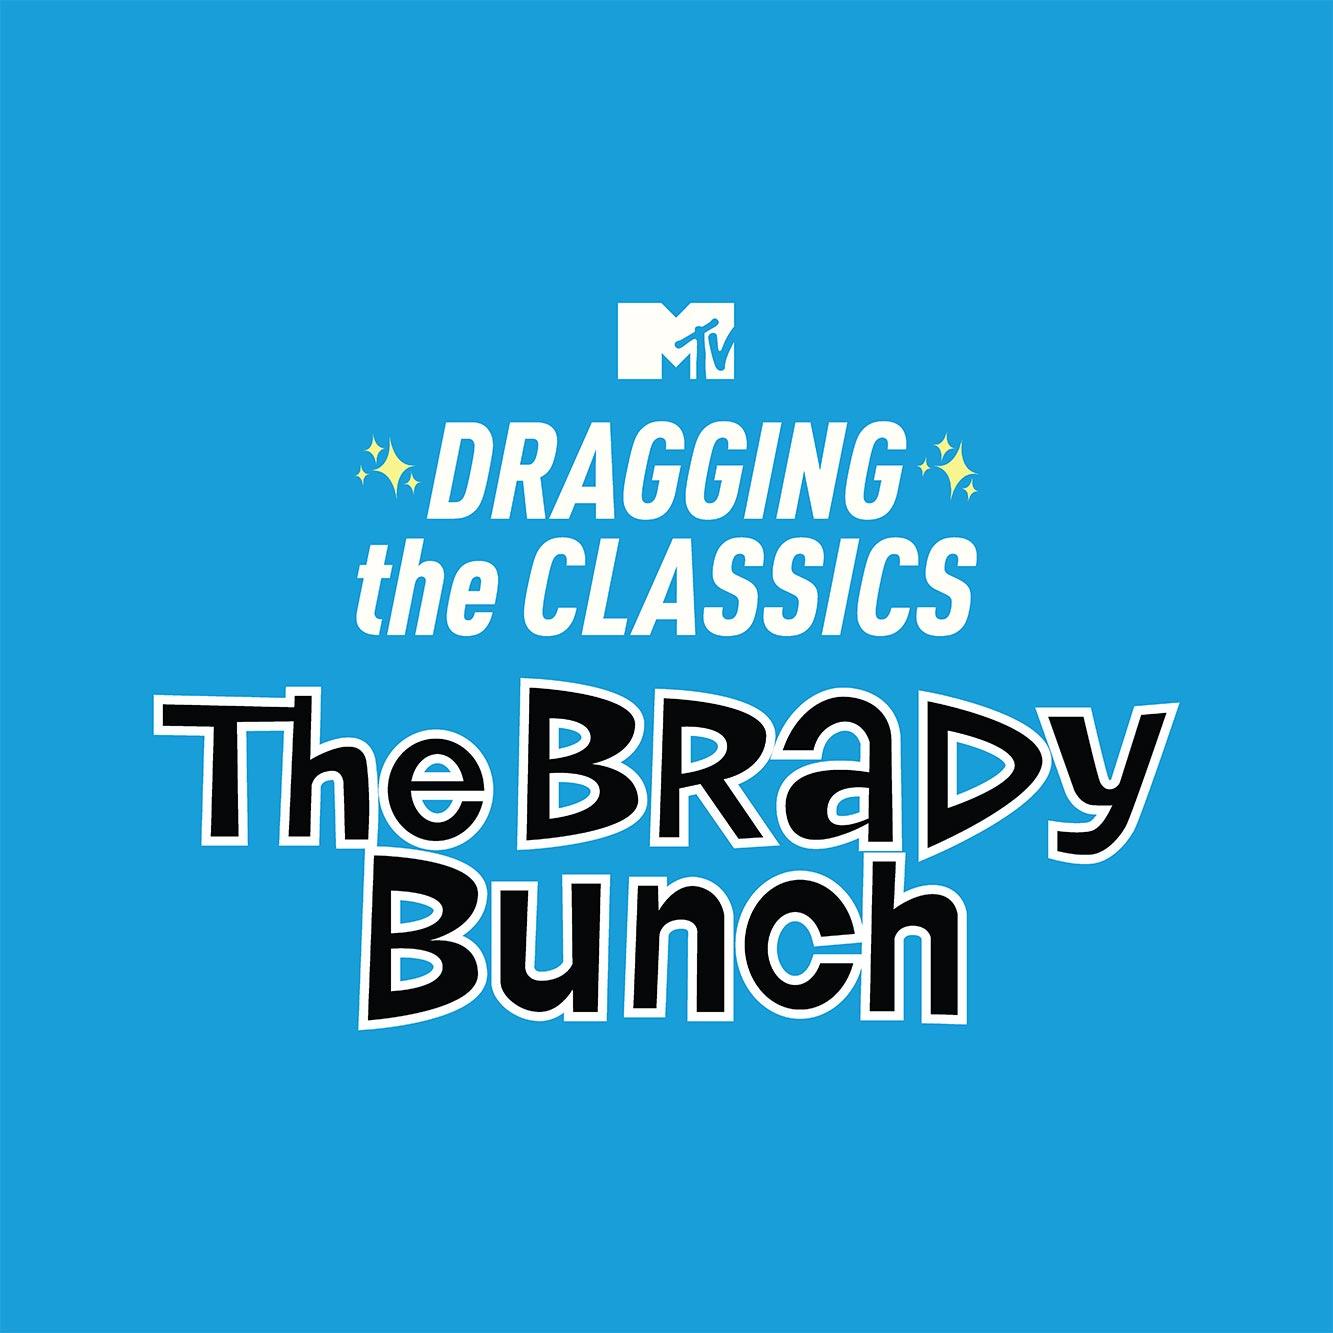 Dragging the Classics - The Brady Bunch